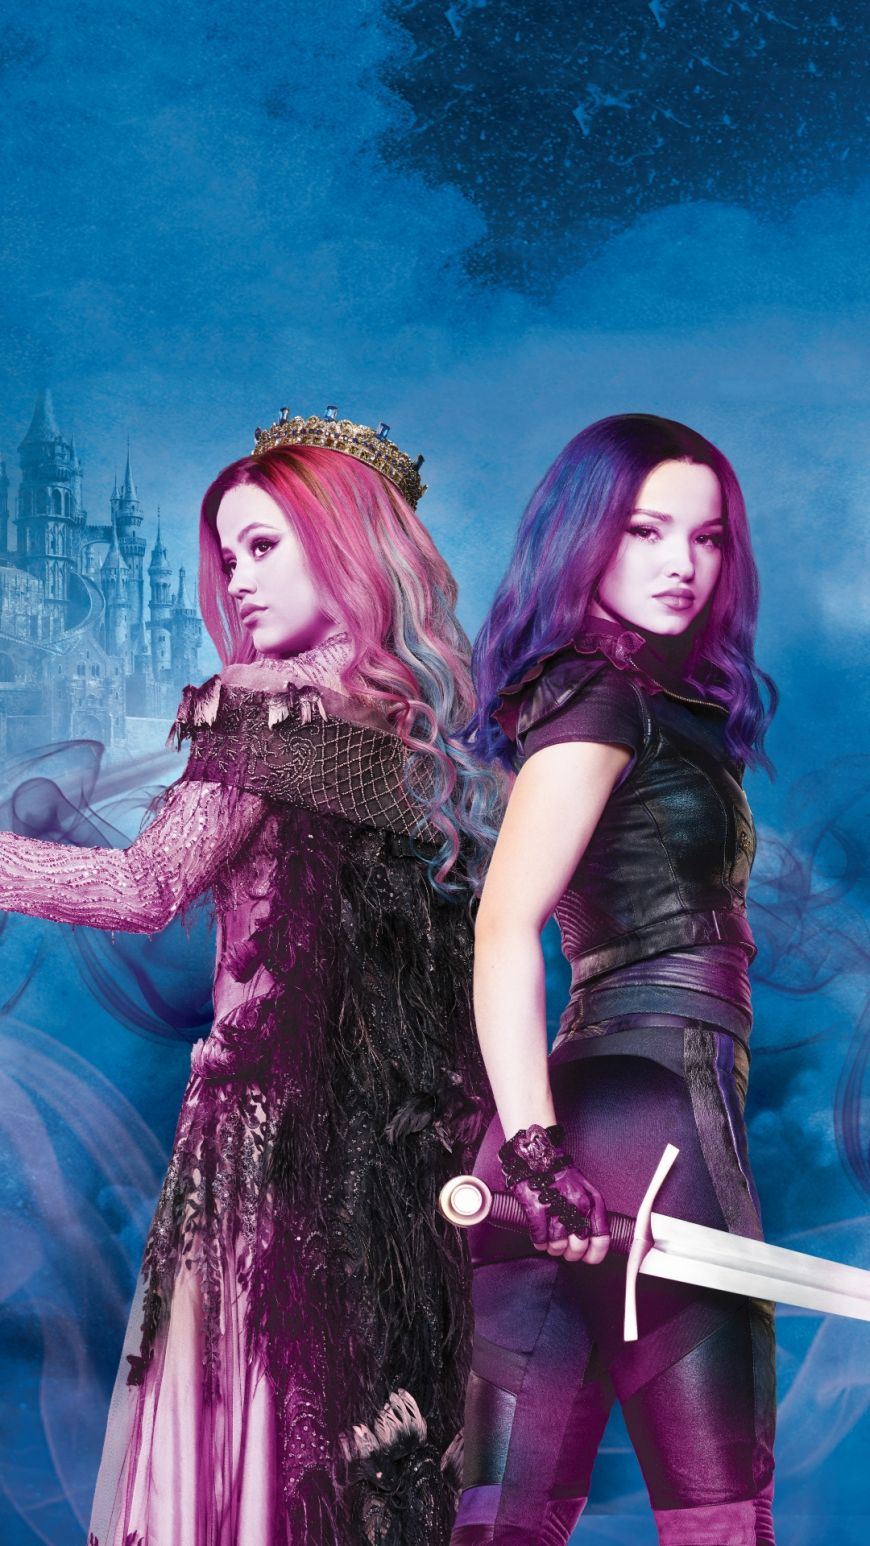 Disney Descendants 3 Mal With A Sword And Audrey Mobile Wallpaper In 2020 Disney Descendants Dolls Disney Descendants 3 Disney Descendants Movie